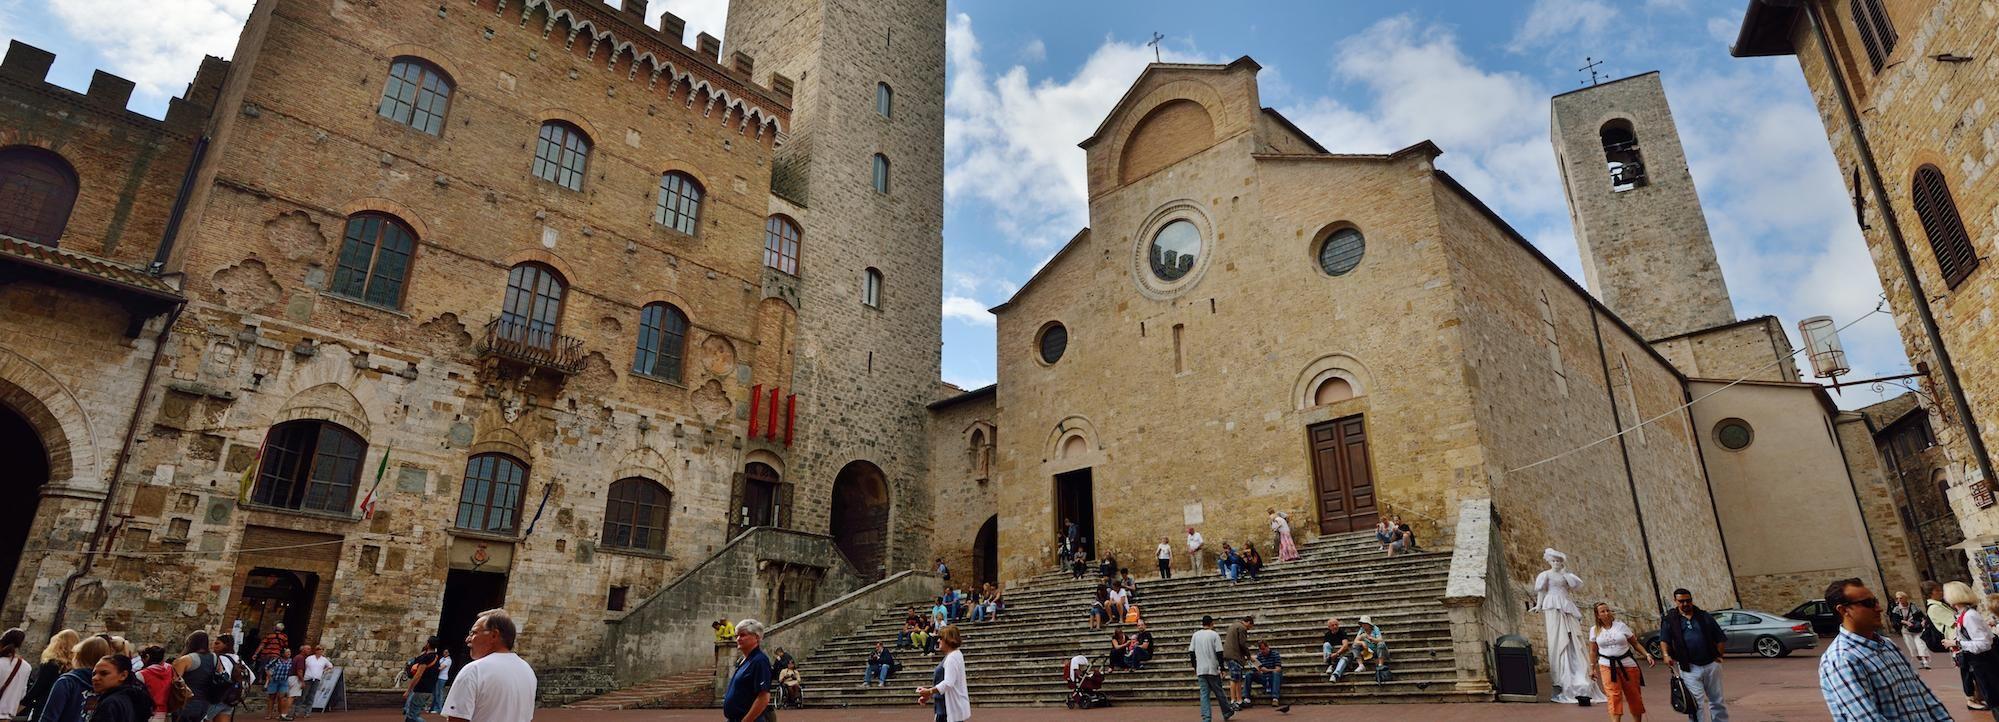 Siena, San Gimignano e Chianti Experience